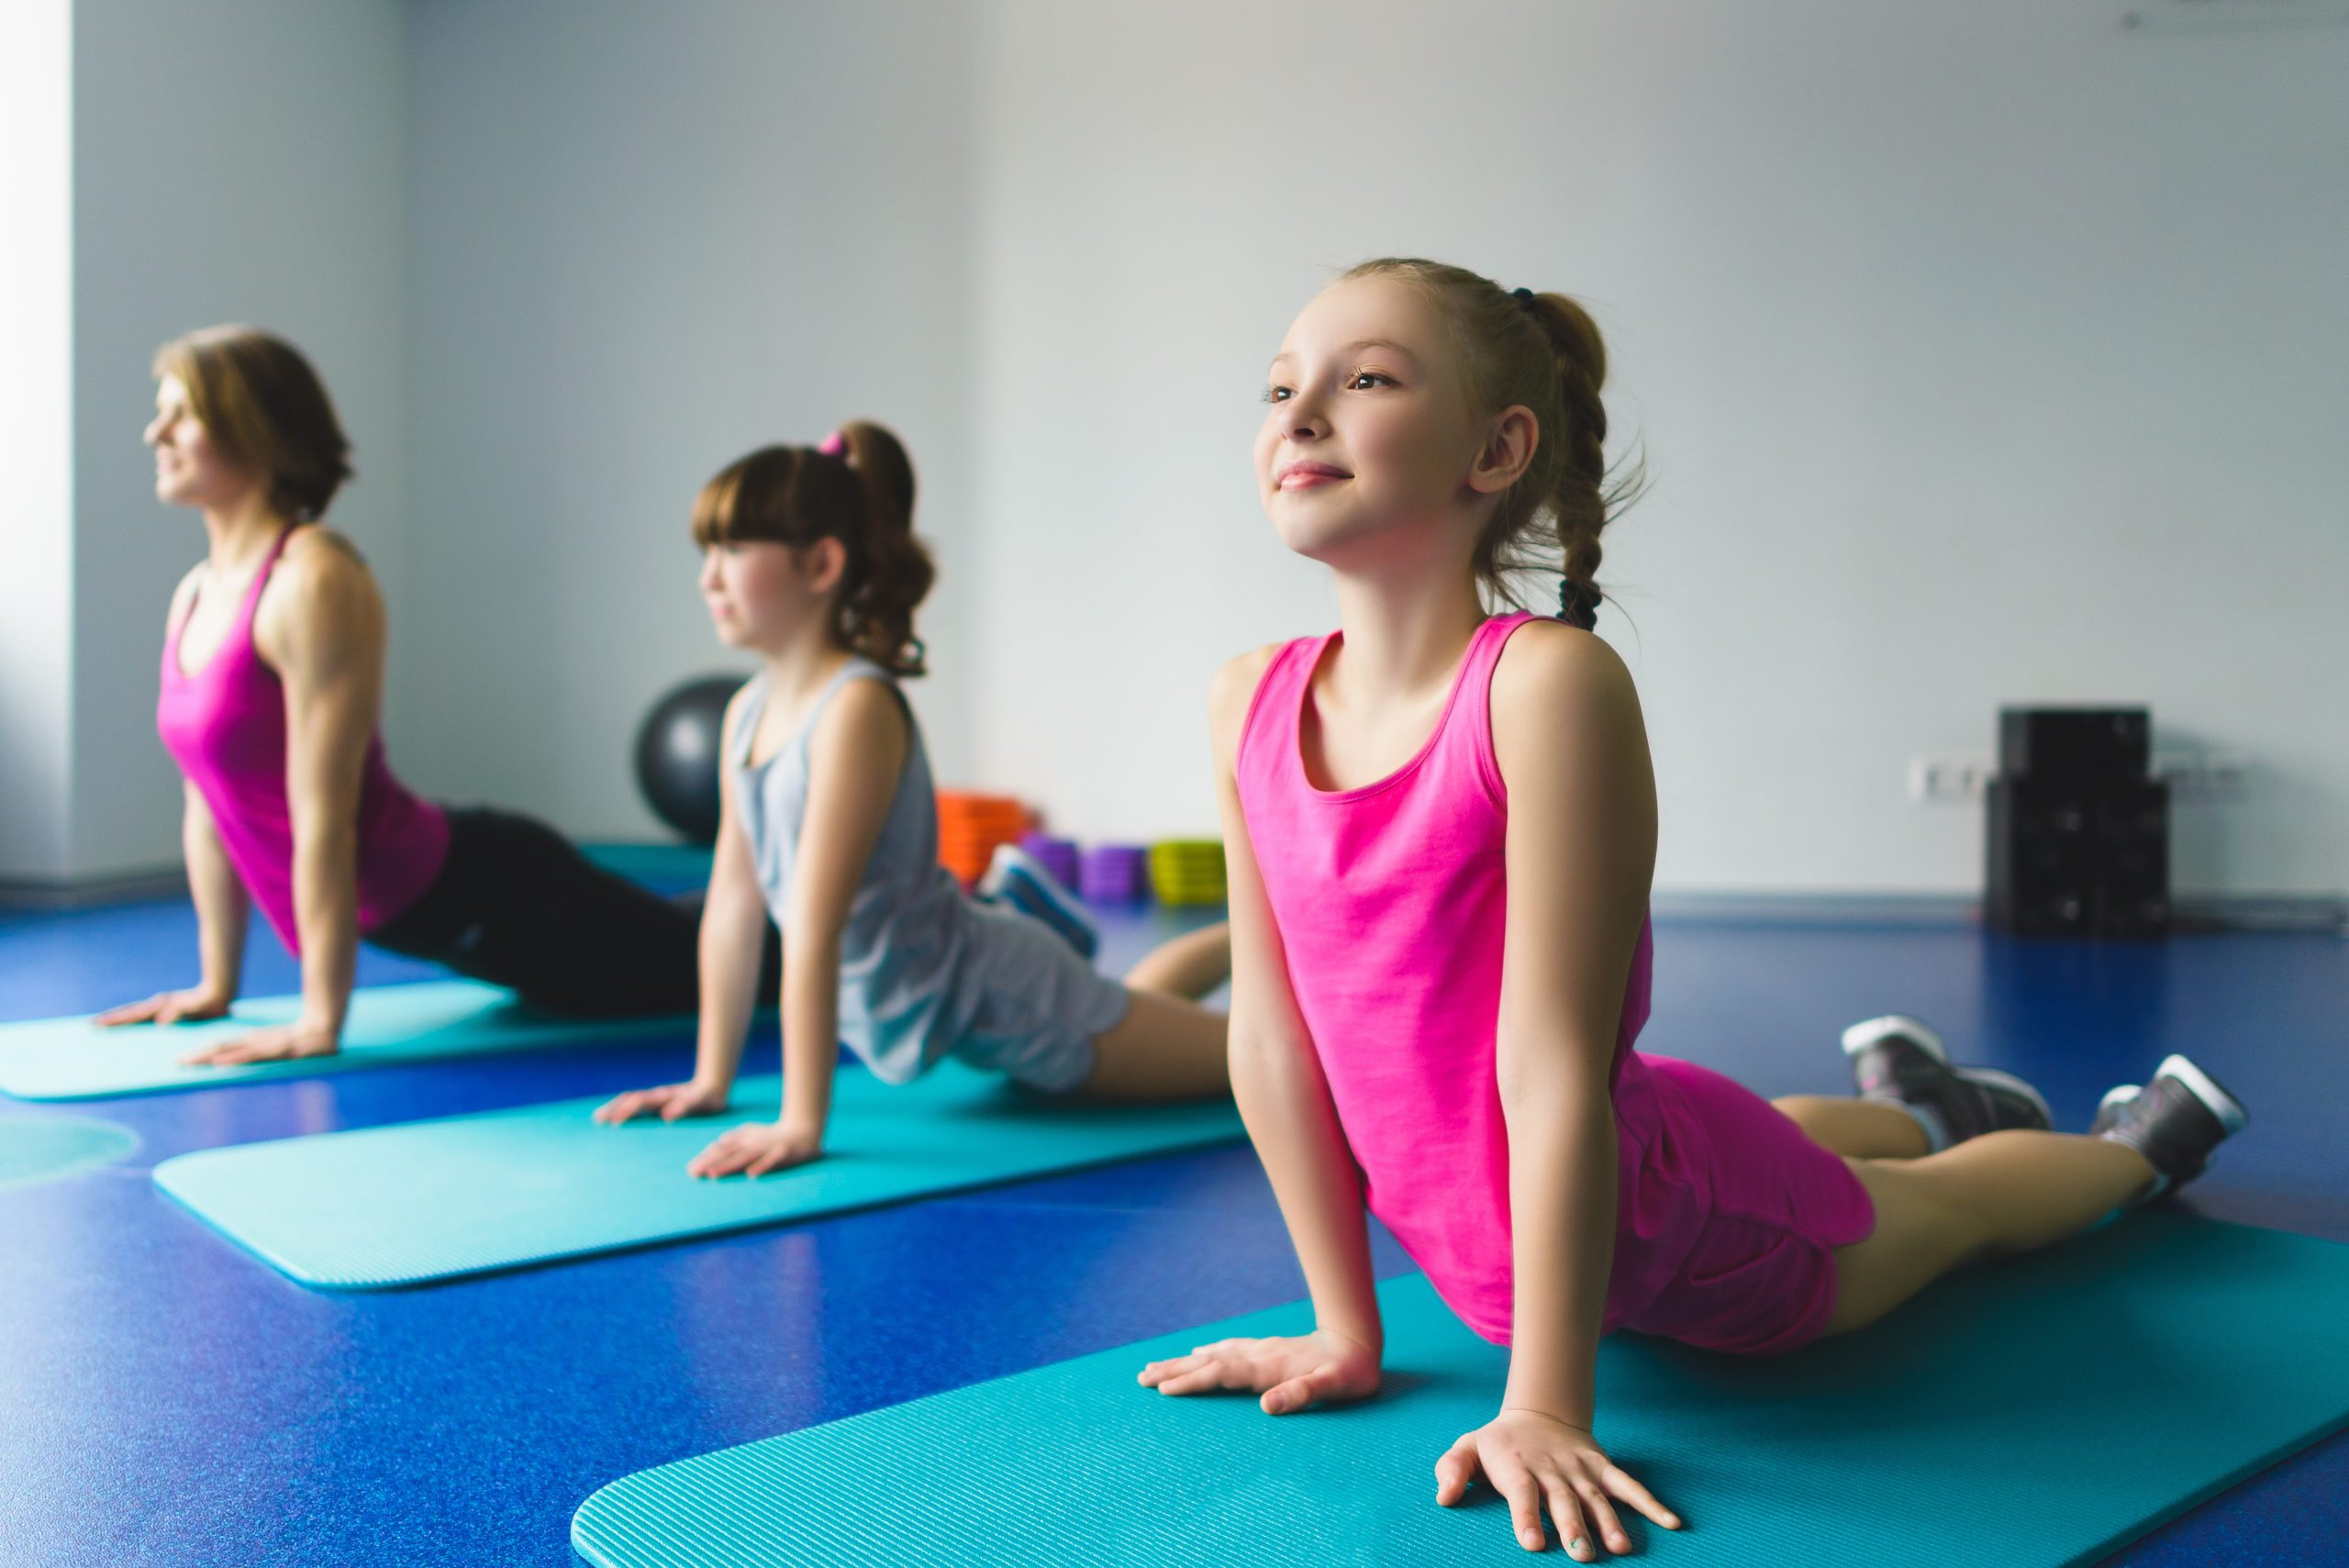 Gymnastics Training & Conditioning Using Resistance Bands